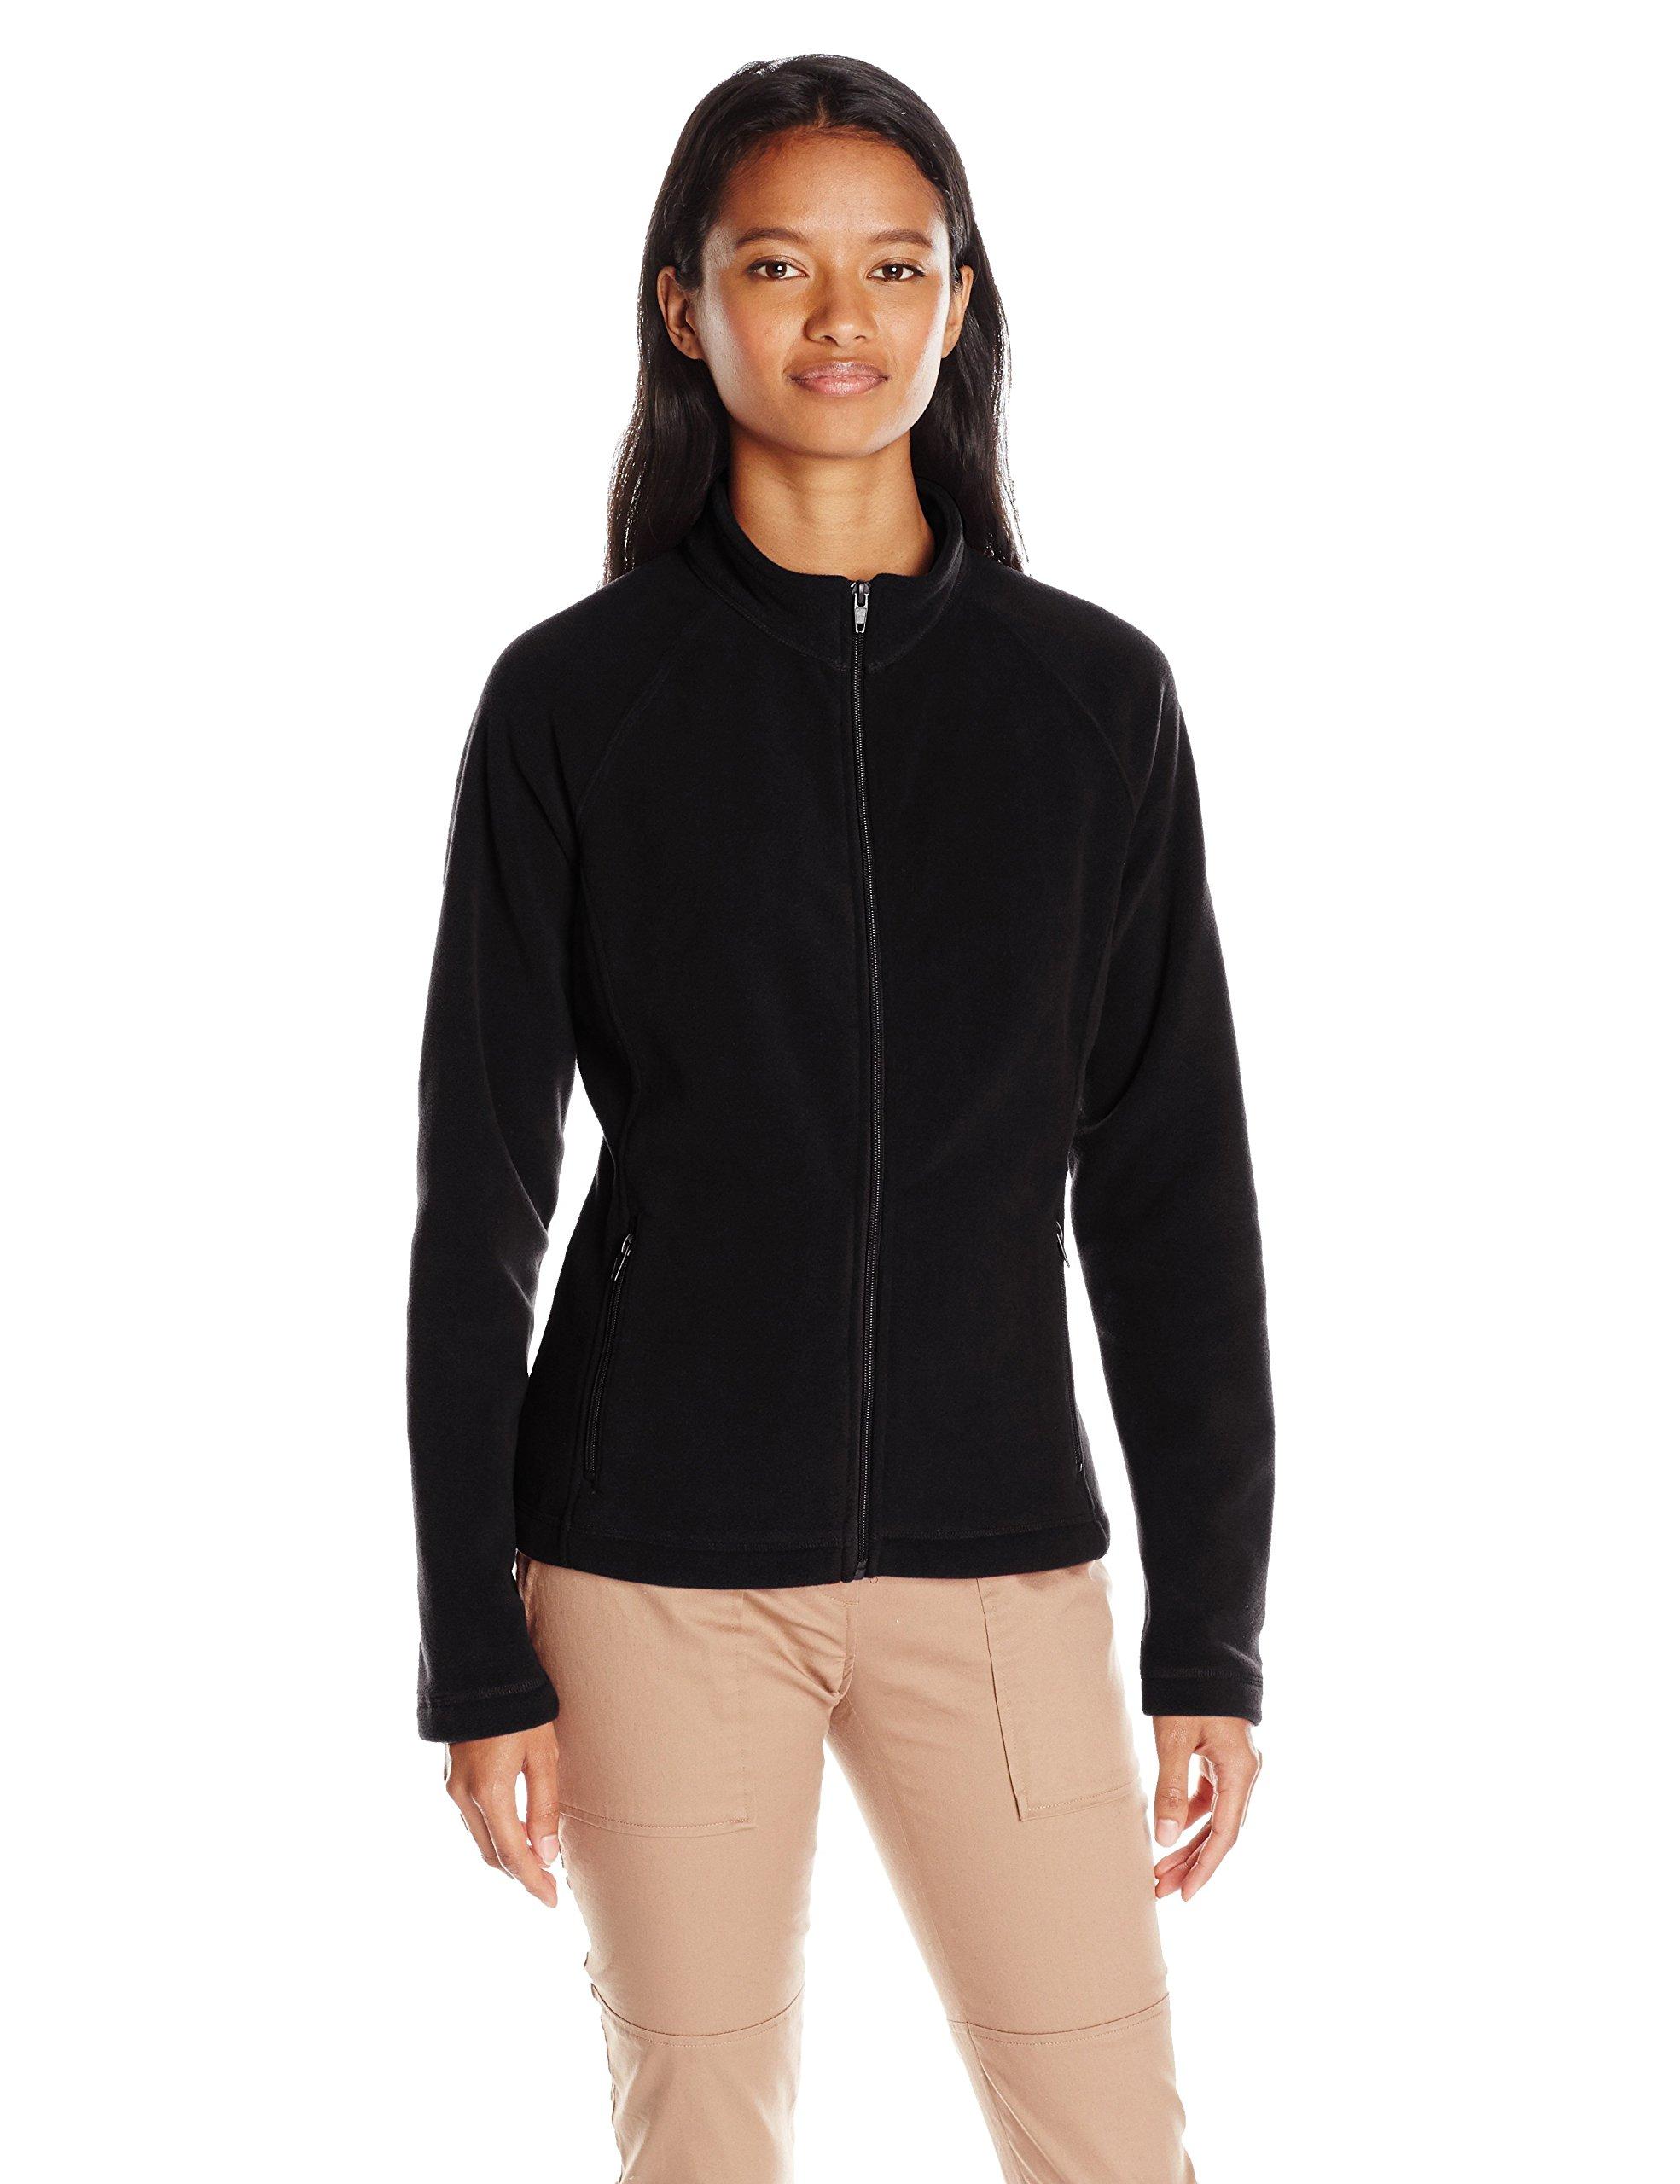 Classroom Uniforms Junior Fitted Polar Fleece Jacket, Black, Large